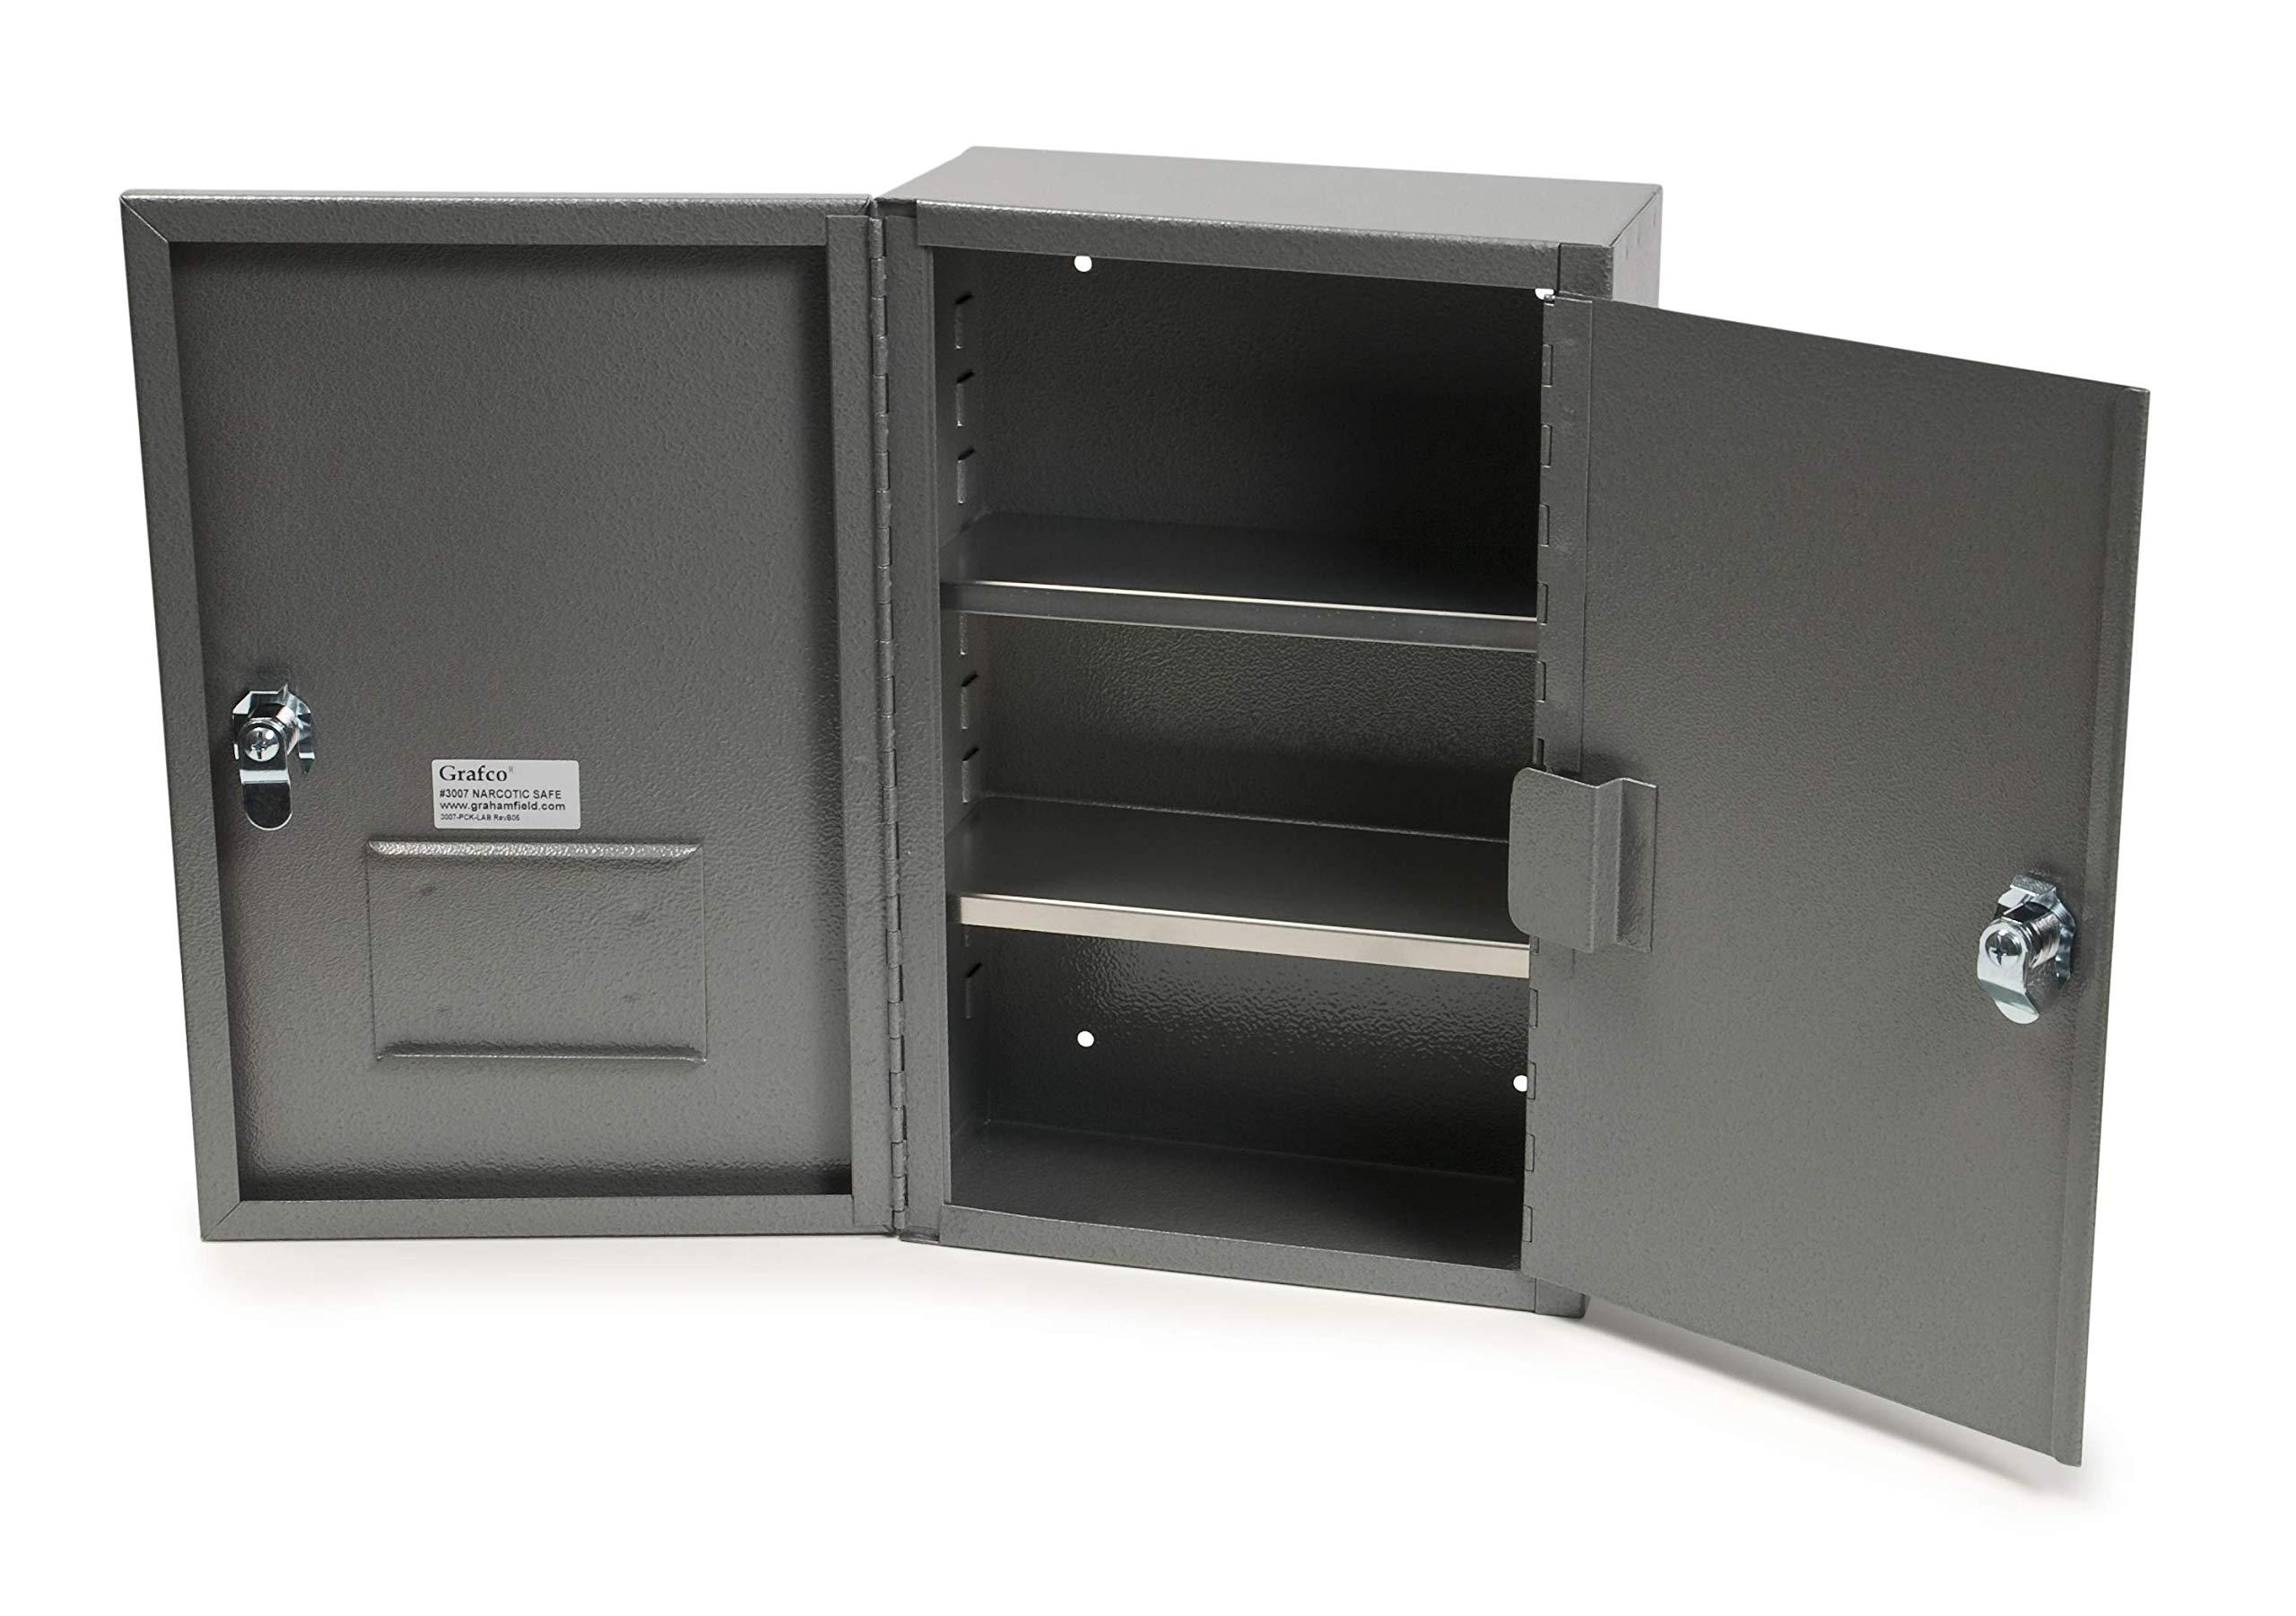 Grafco 3008 Narcotic Safe, 24'' x 16'' x 8'', 22 lb. Capacity